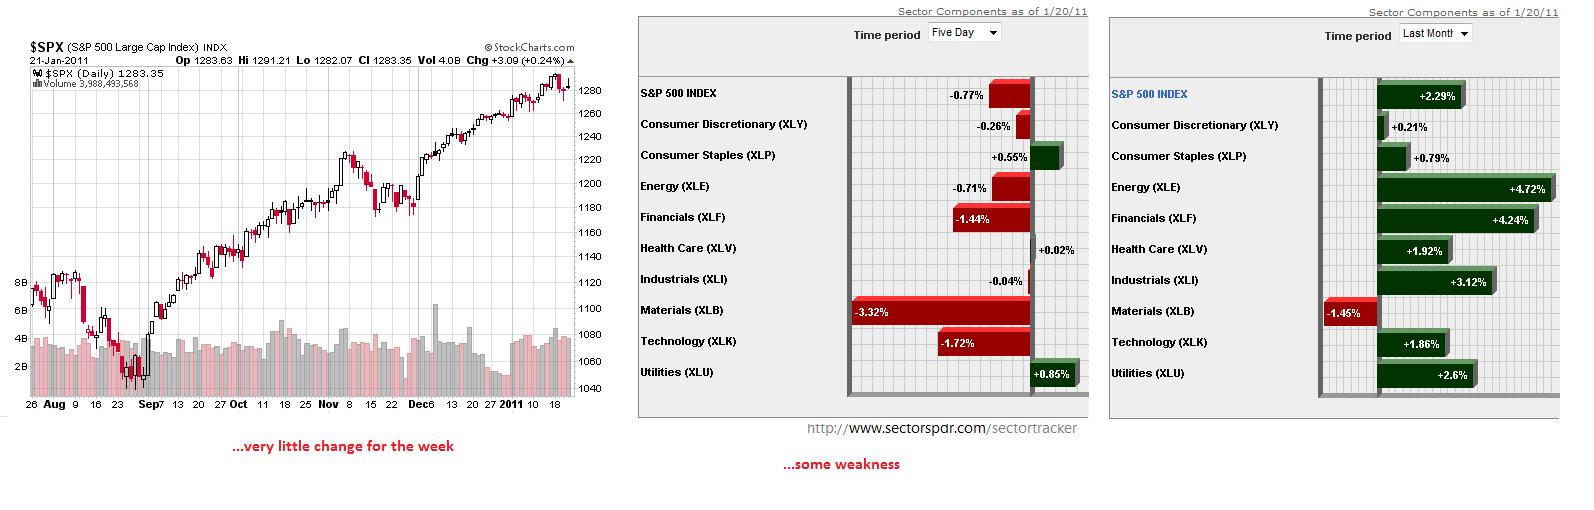 stock market update  january 2011